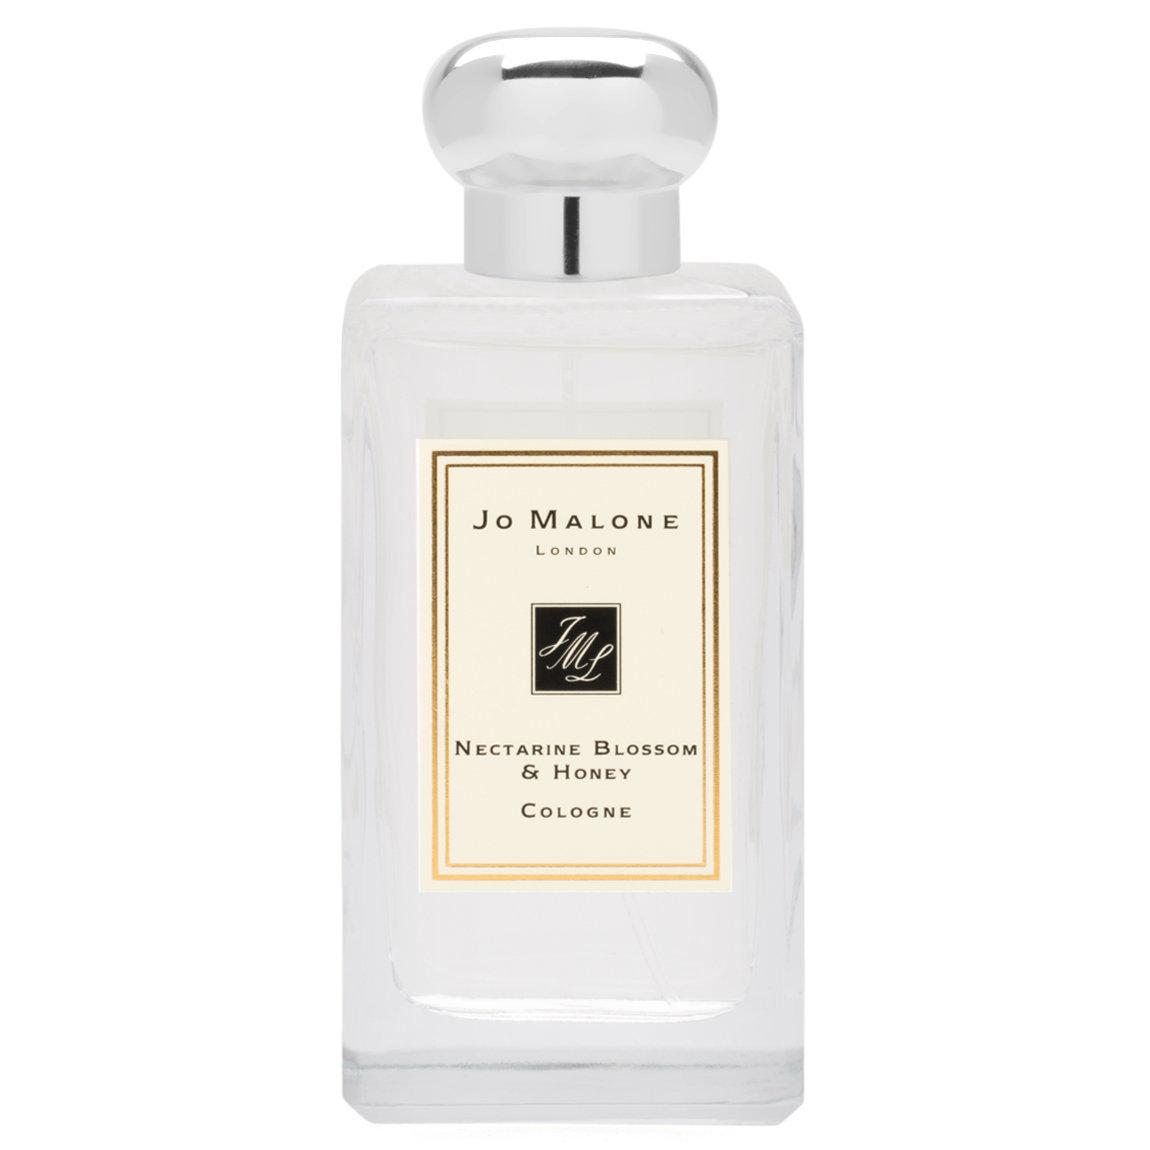 Jo Malone London Nectarine Blossom & Honey Cologne 100 ml alternative view 1 - product swatch.